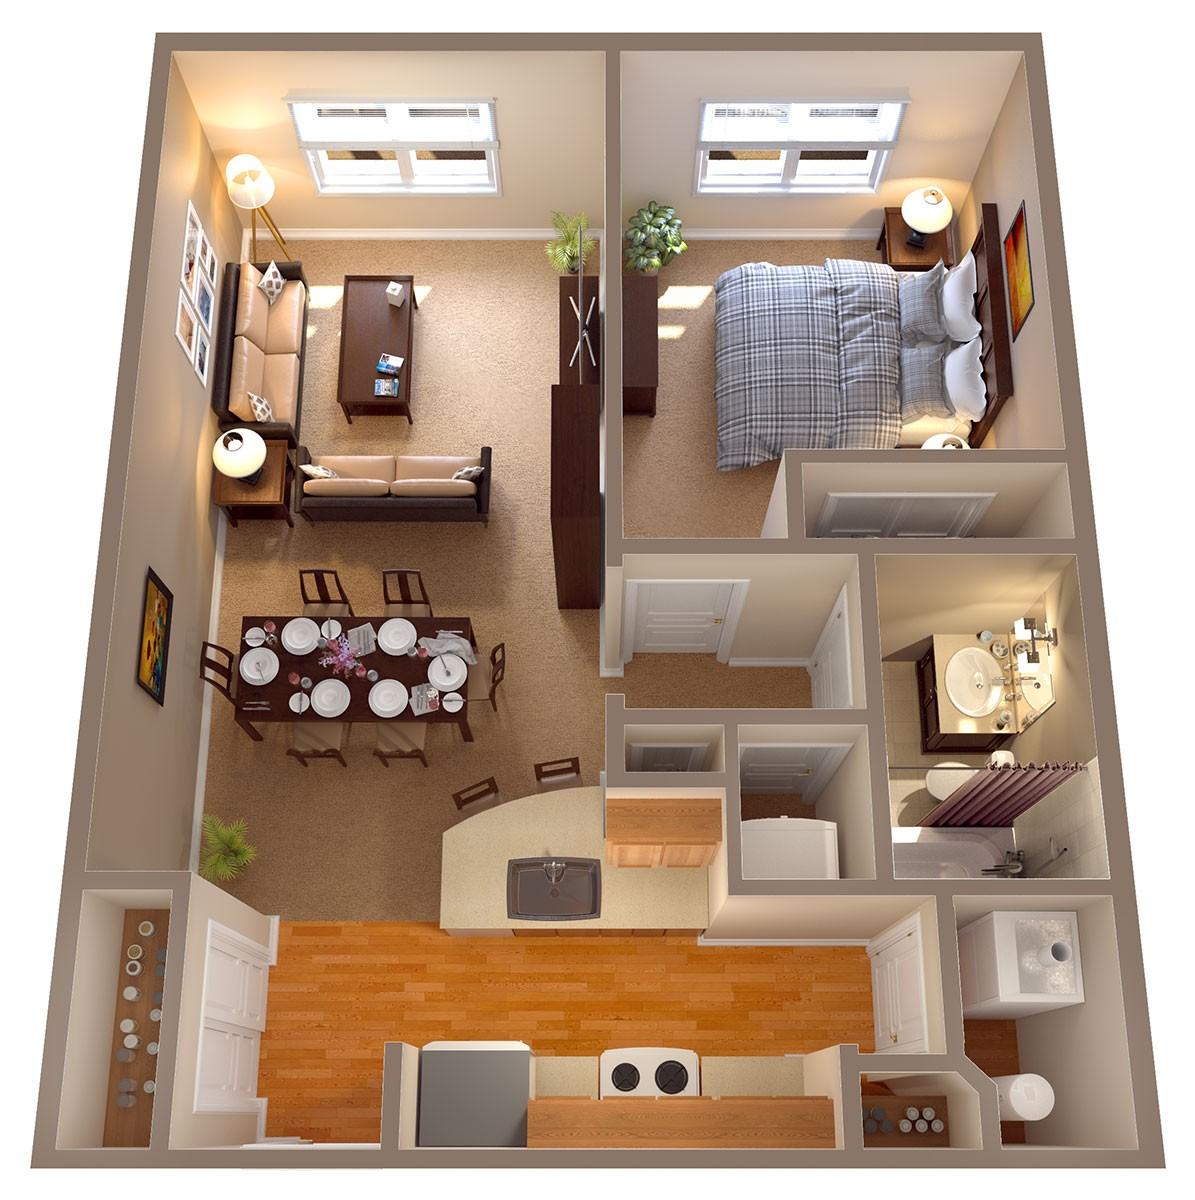 Spacious Apartment Floor Plans Rollins Ridge,Blueprint Tiny House Plans Free Pdf